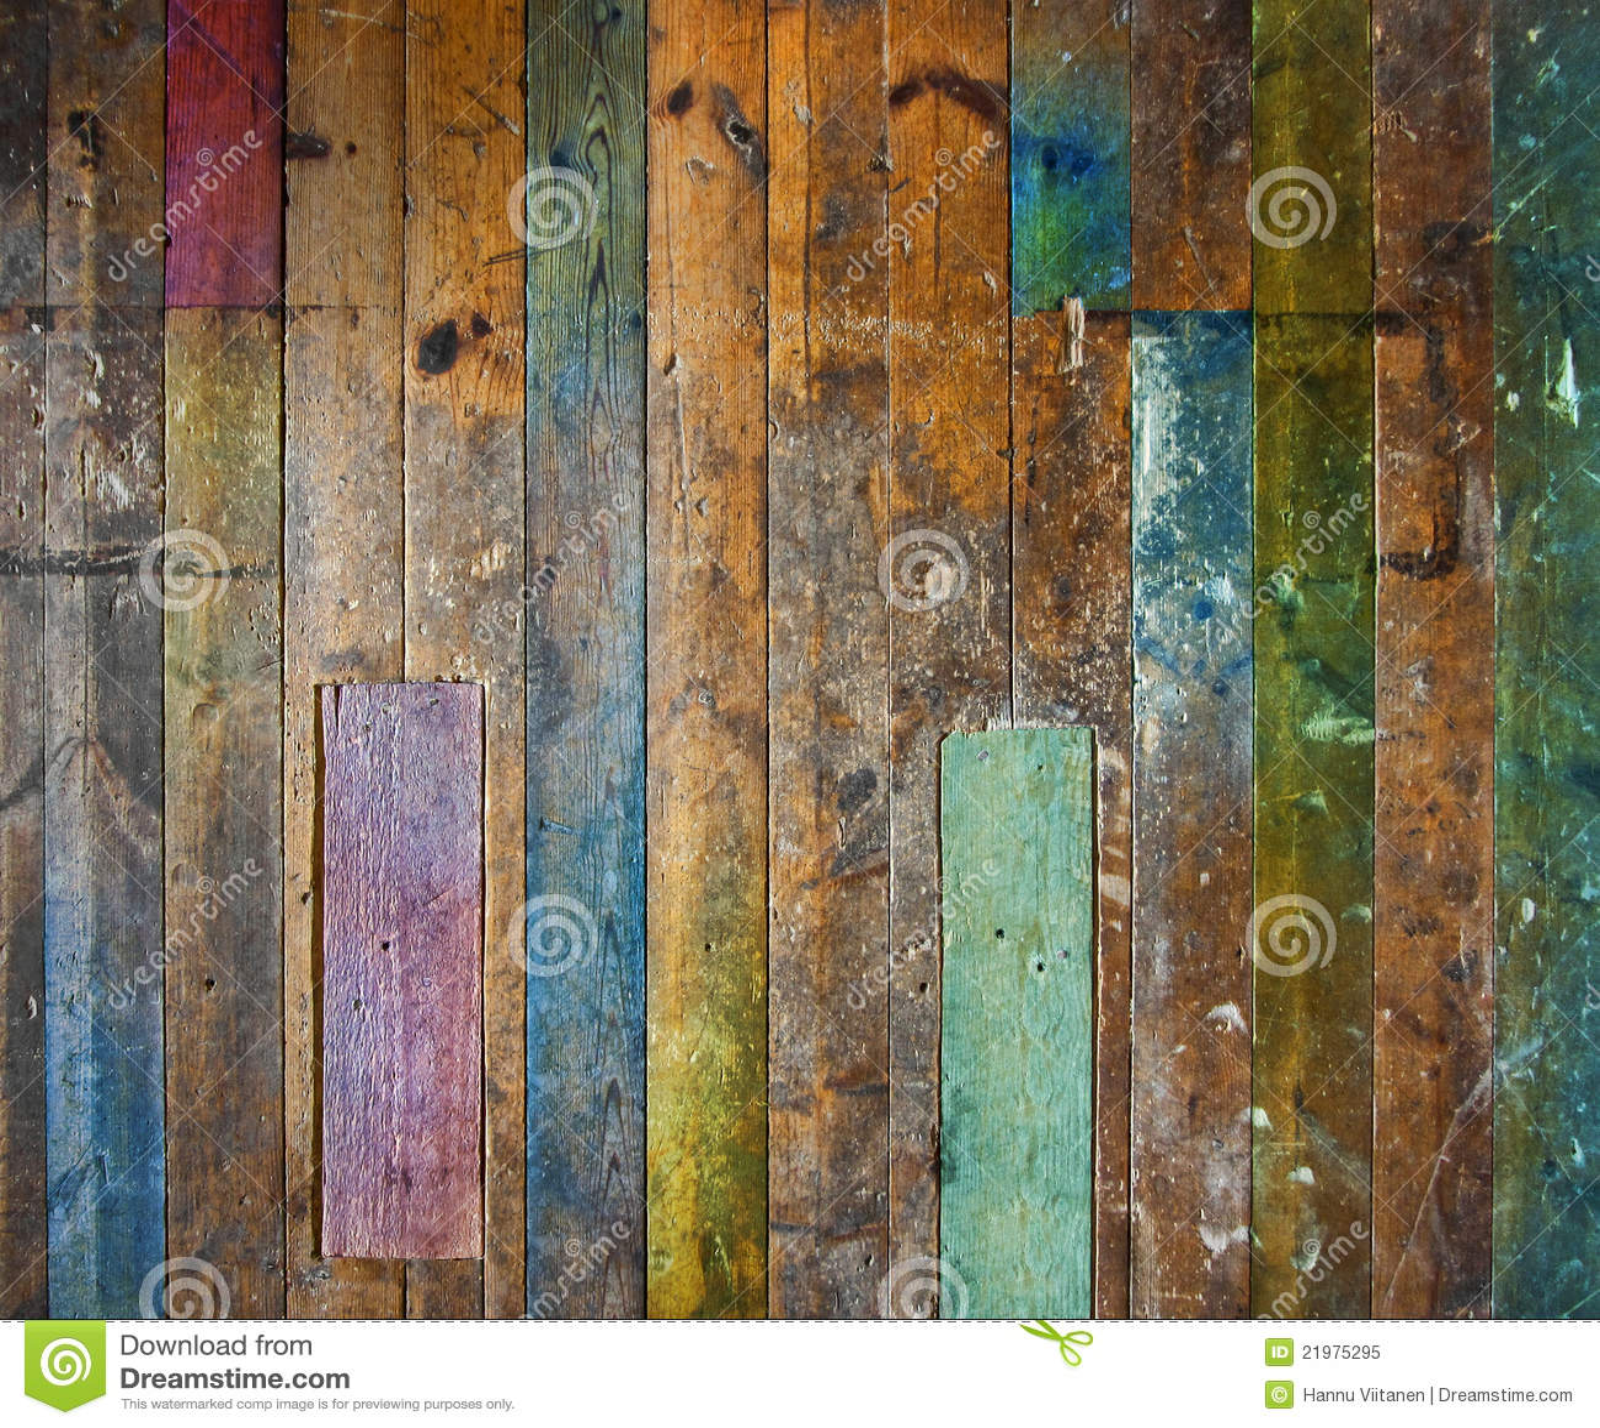 Bunter alter hölzerner Fußboden oder Wand